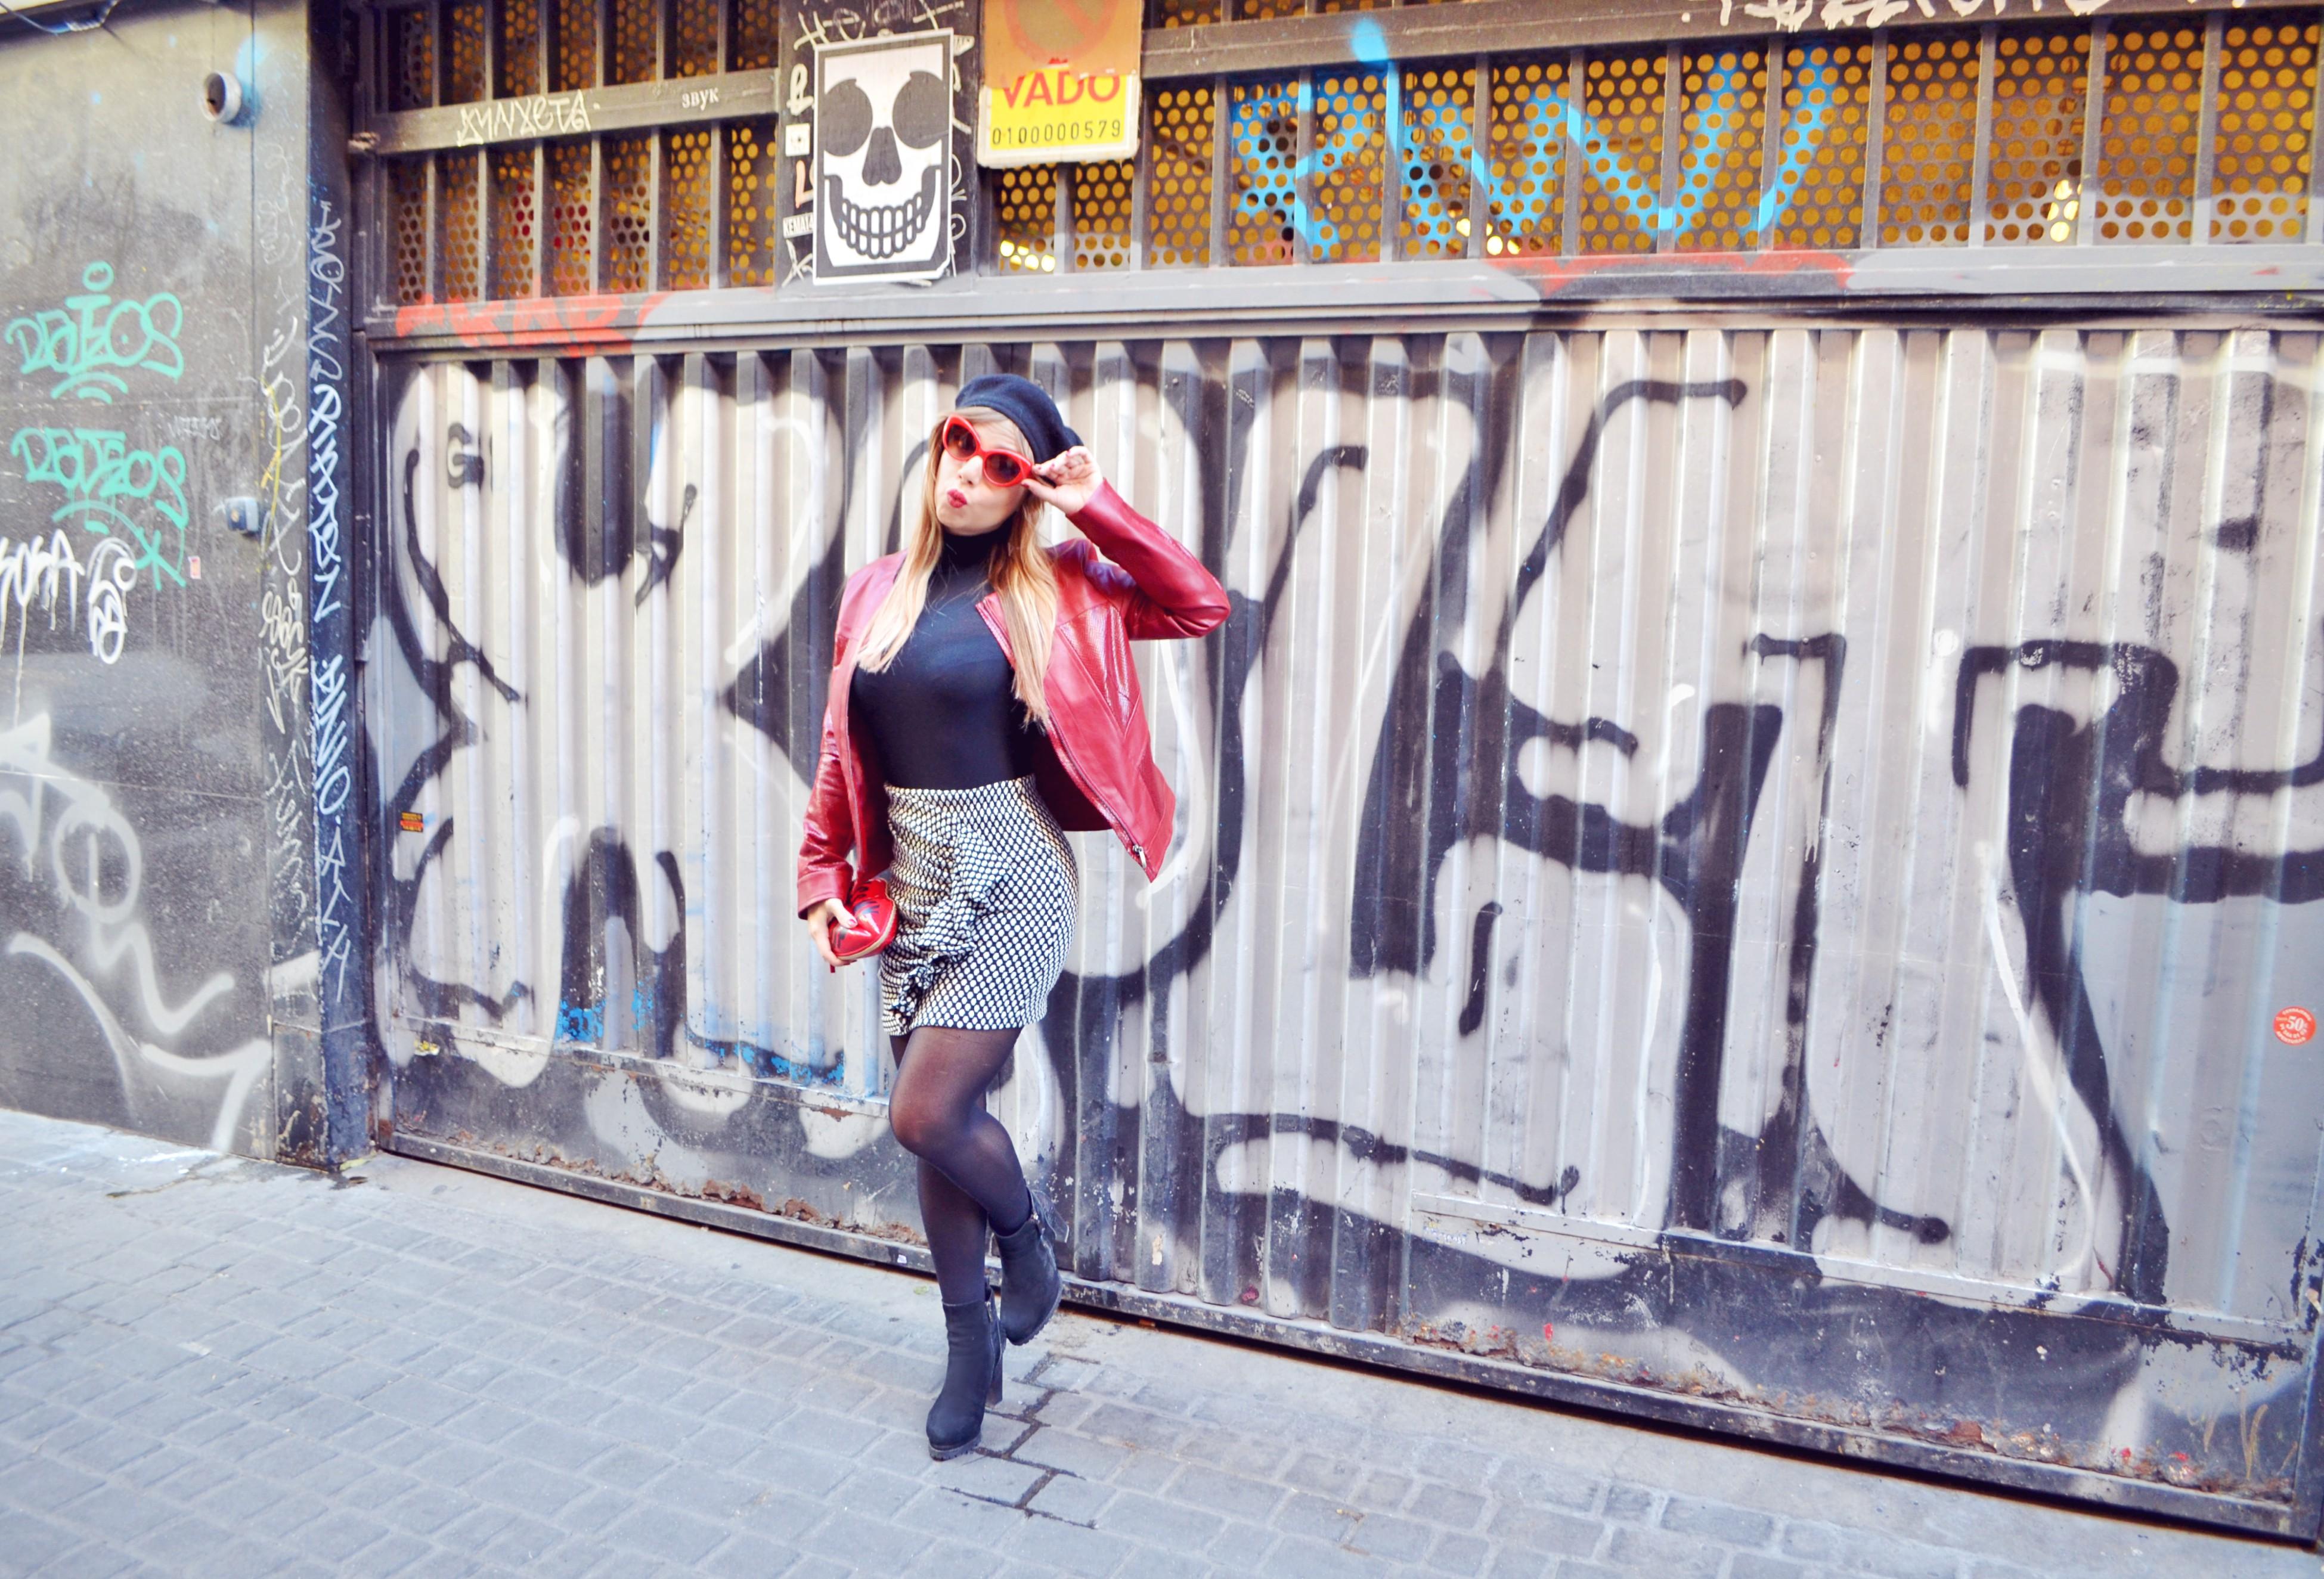 Arggido-ropa-blog-de-moda-ChicAdicta-fashionista-Chic-Adicta-influencer-Madrid-faldas-con-volantes-chupa-roja-PiensaenChic-Piensa-en-Chic